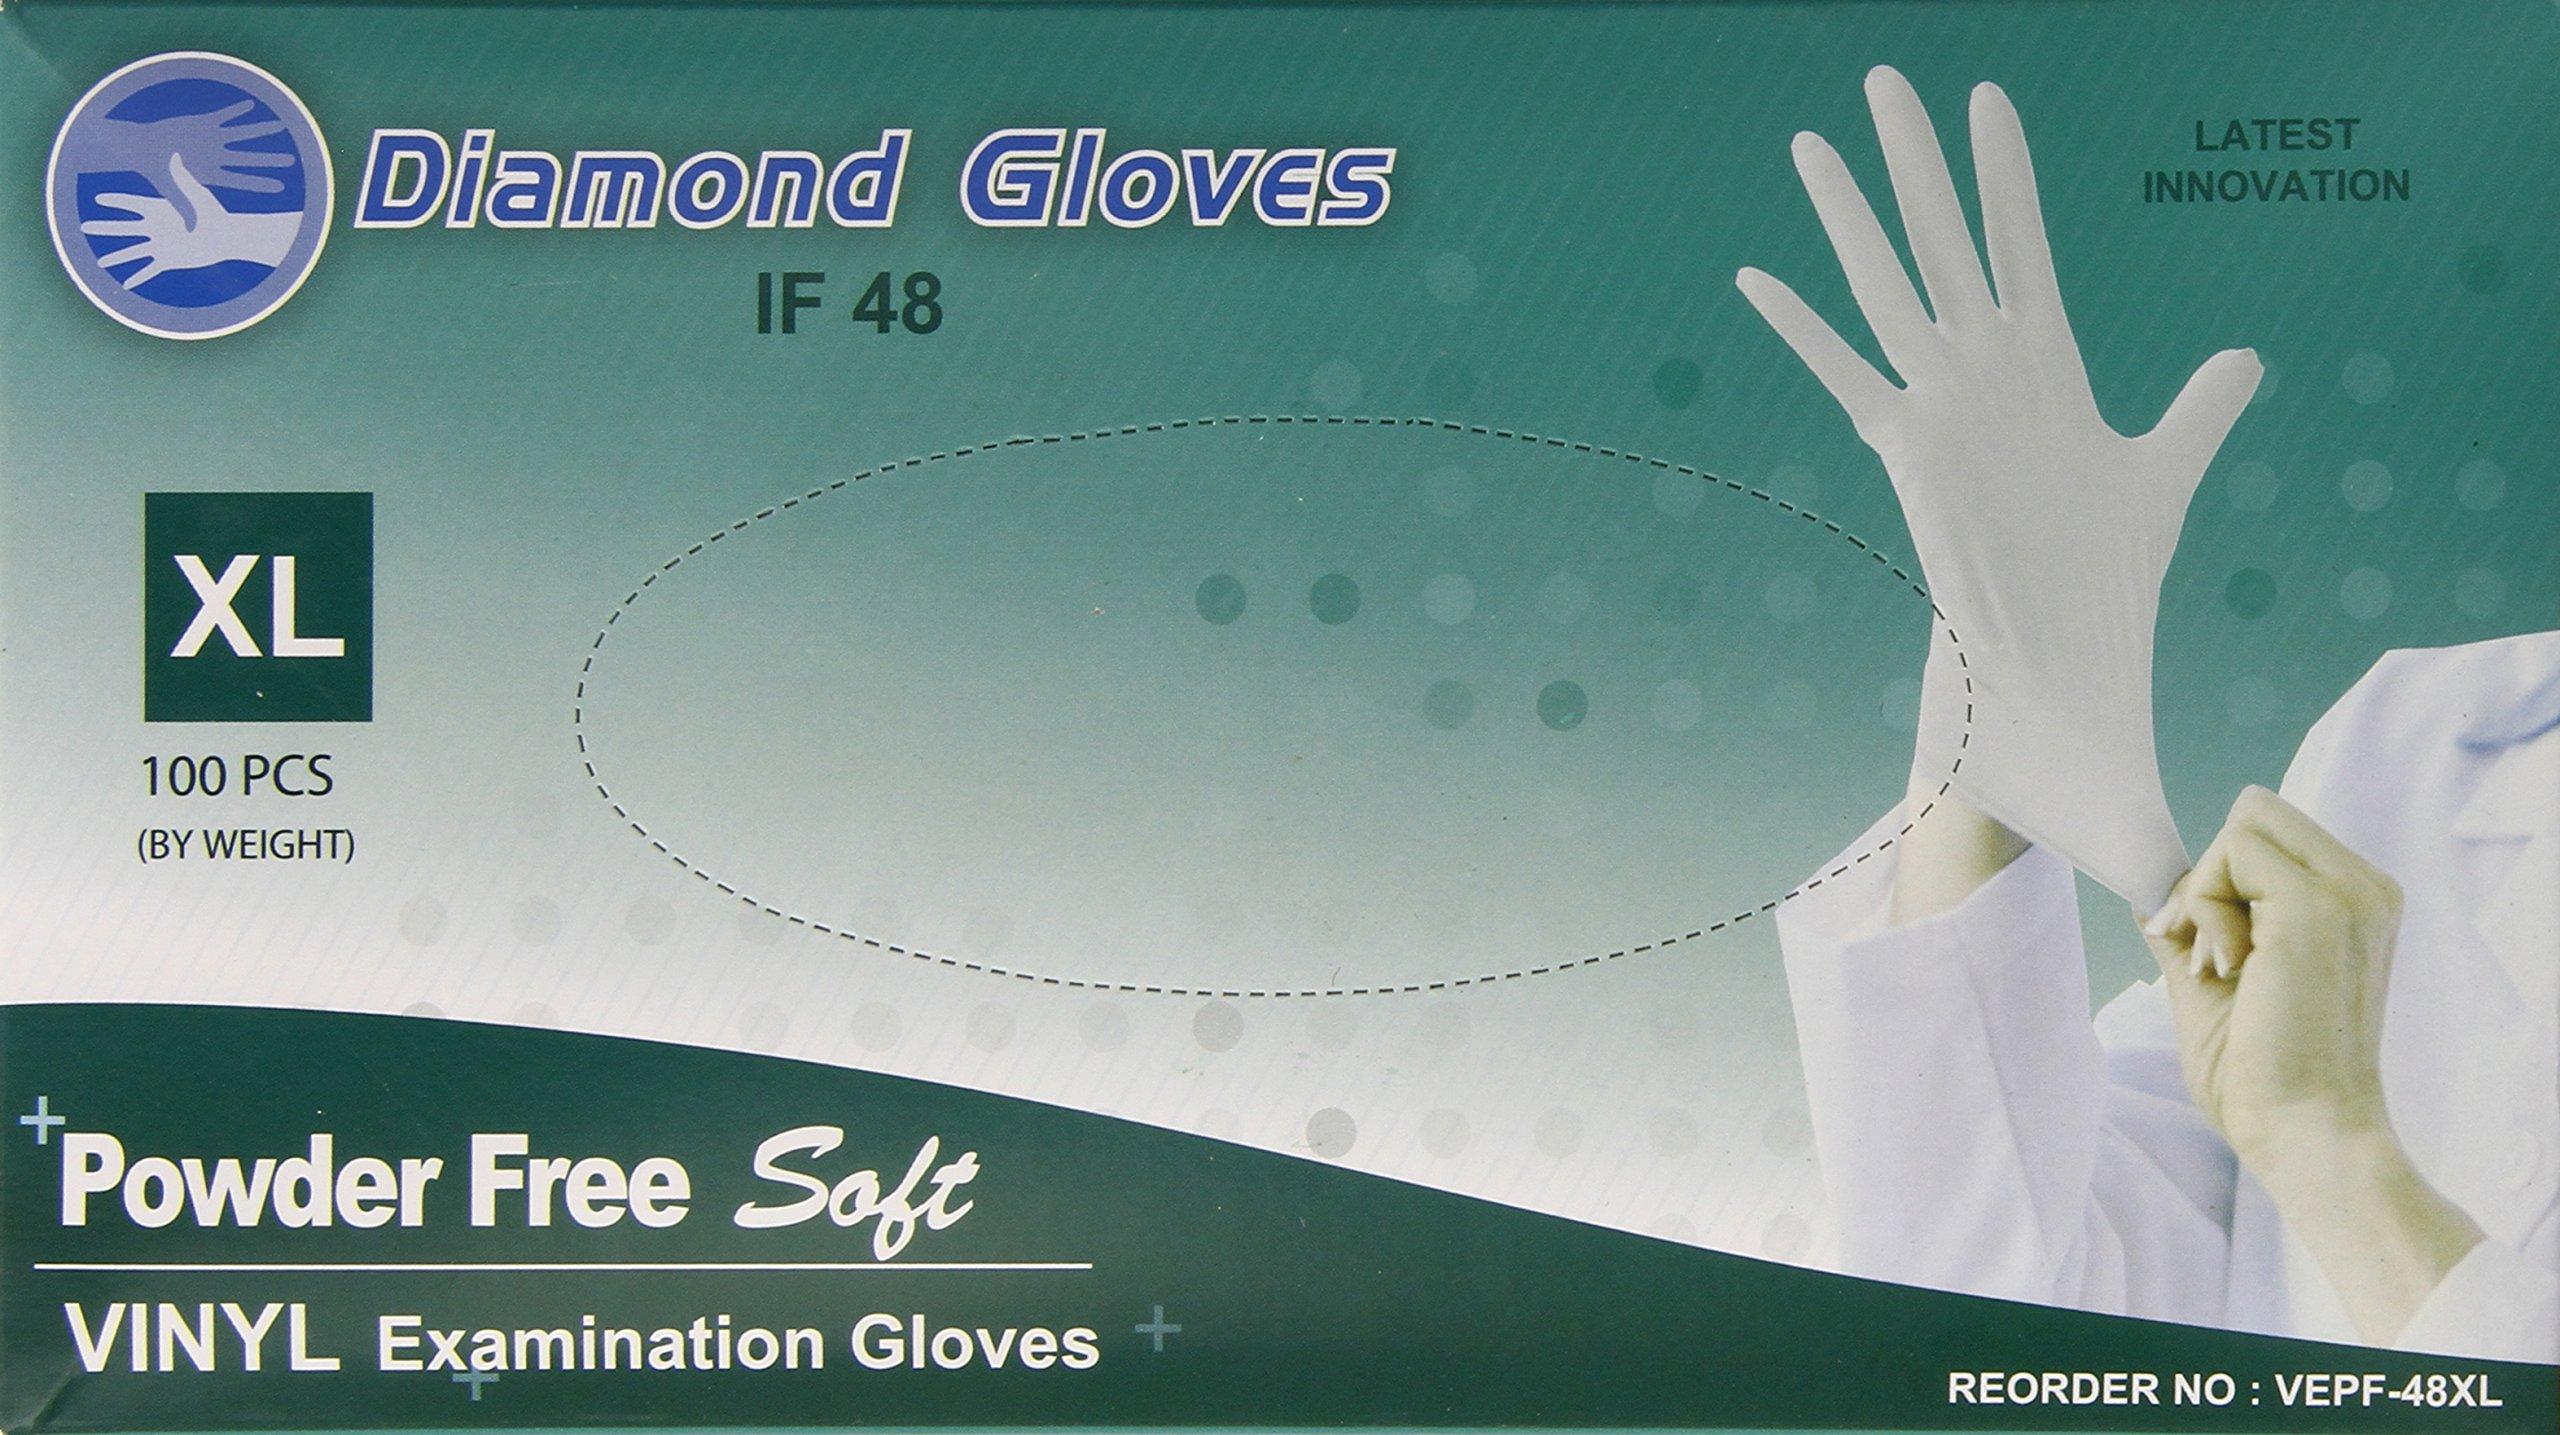 Diamond Gloves Advance Powder-Free Soft Vinyl Examination Gloves, Clear, X-Large, 100 Count